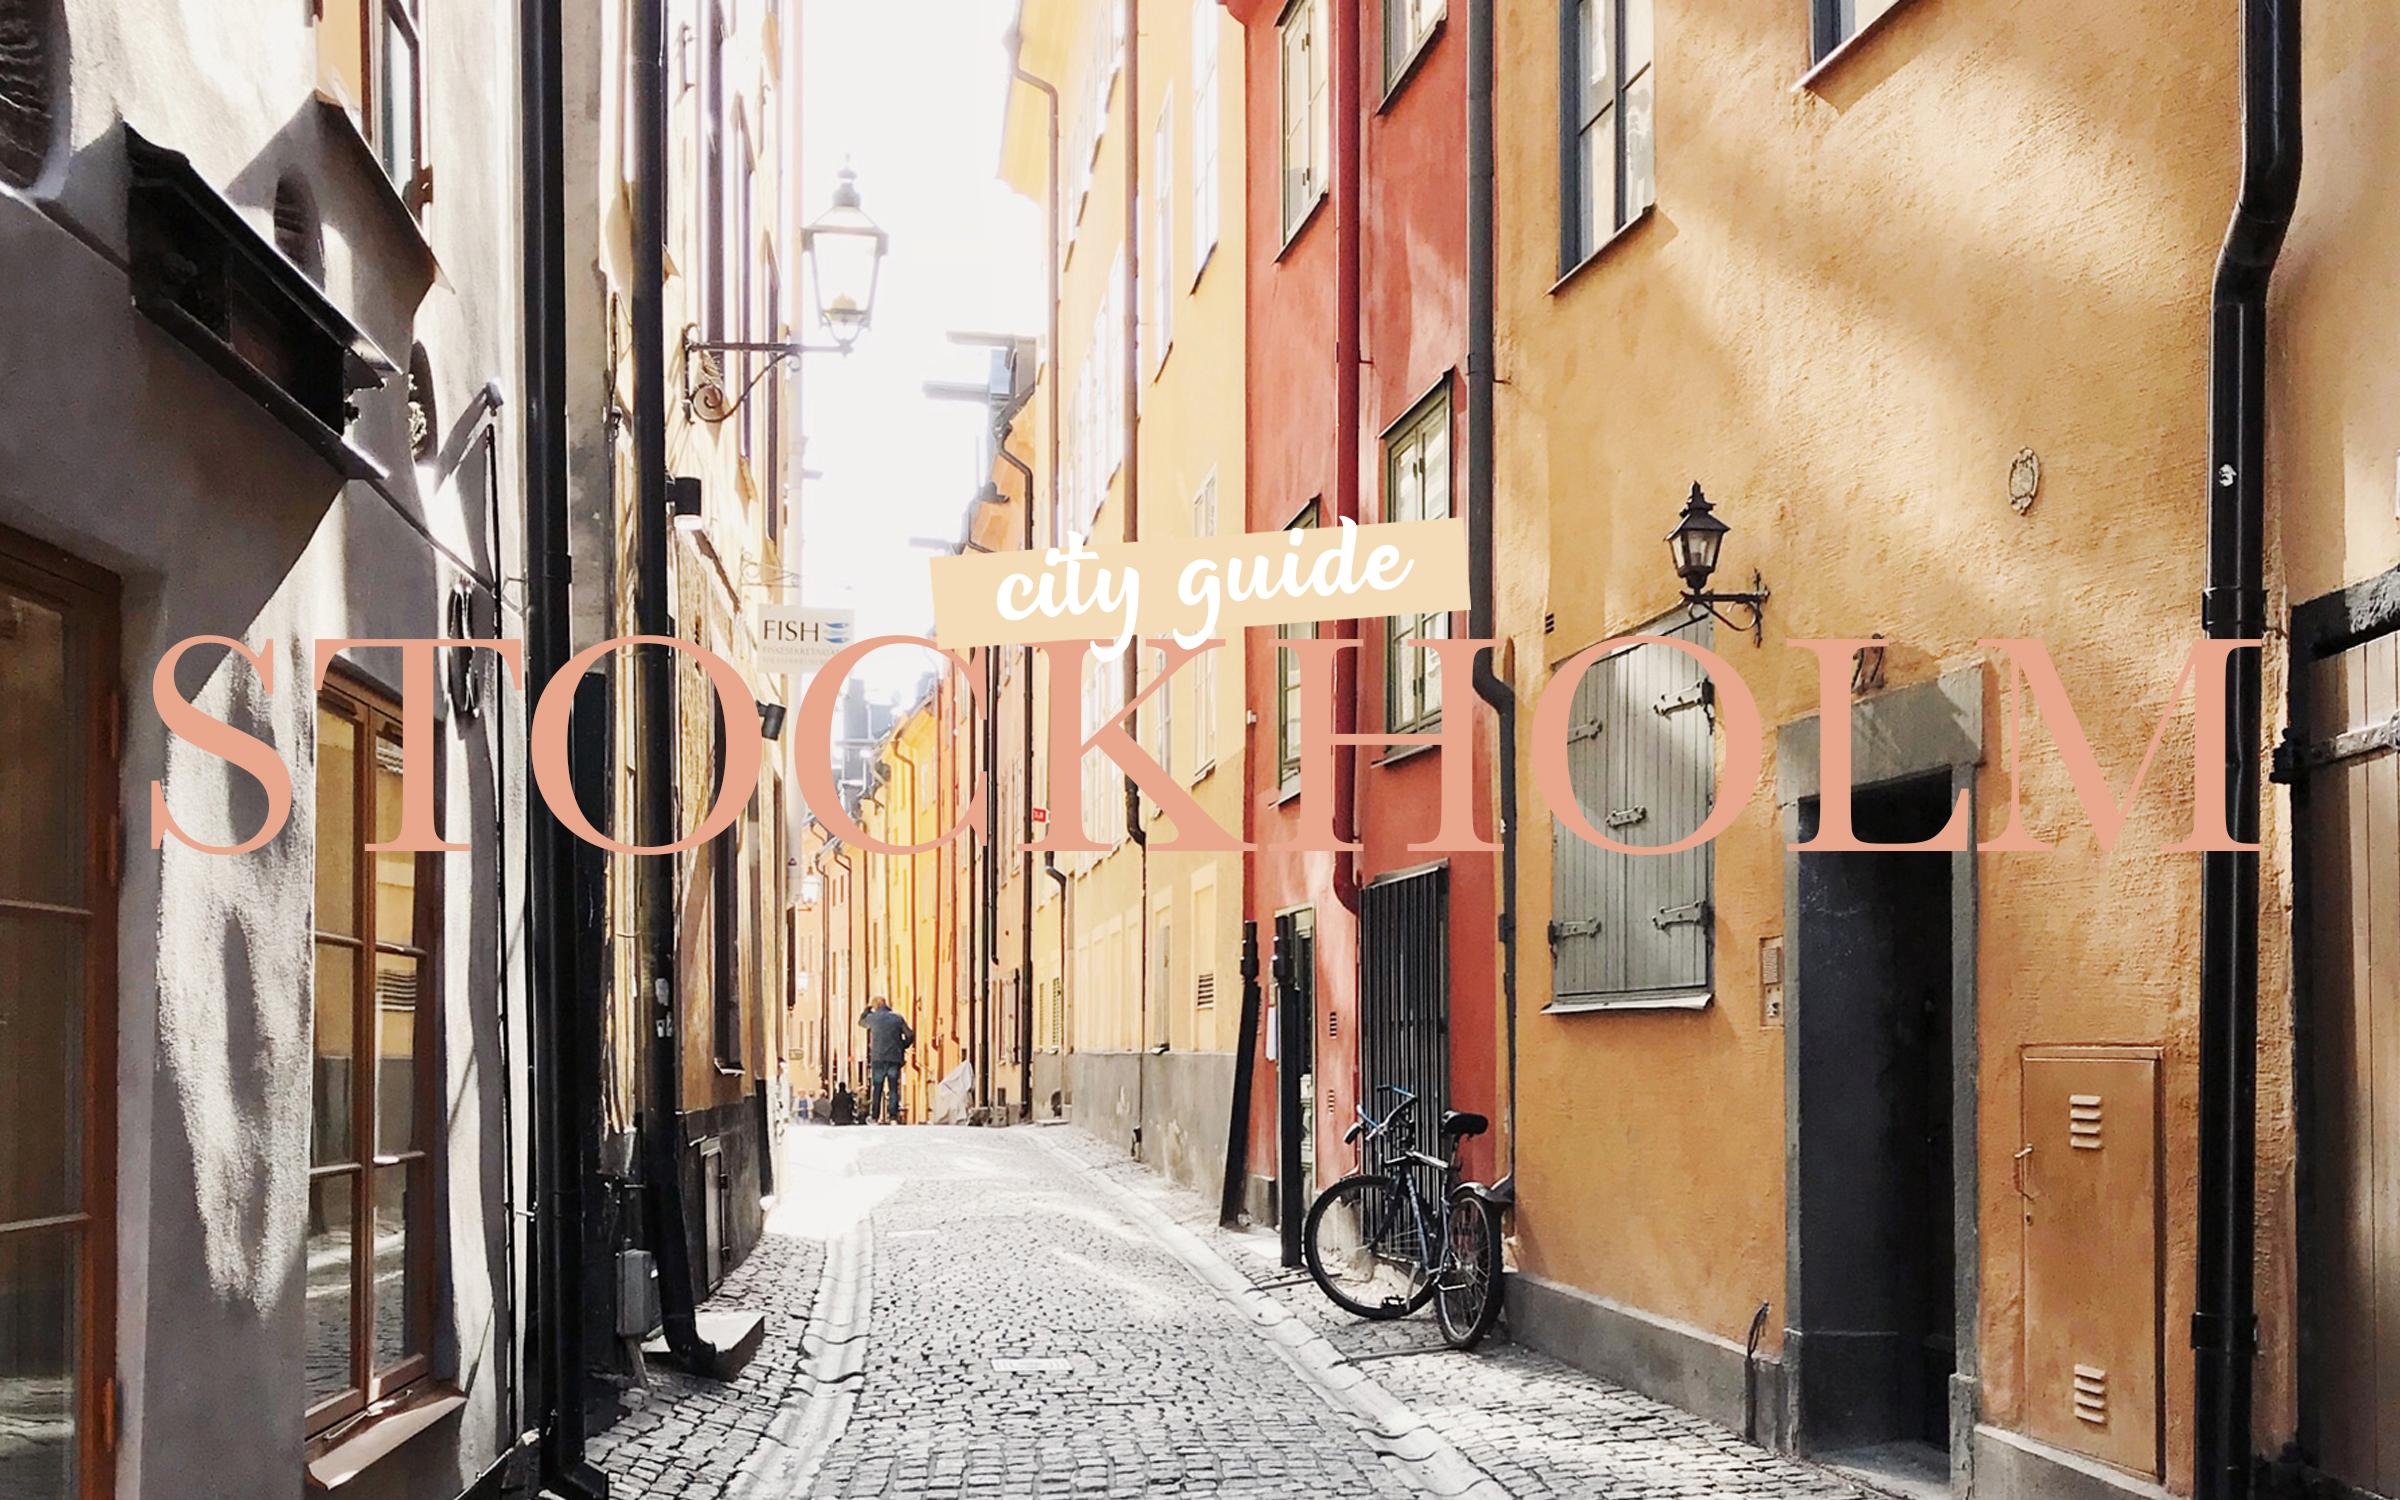 Stockholm_Porto_Guide_Carin_Olsson.jpg